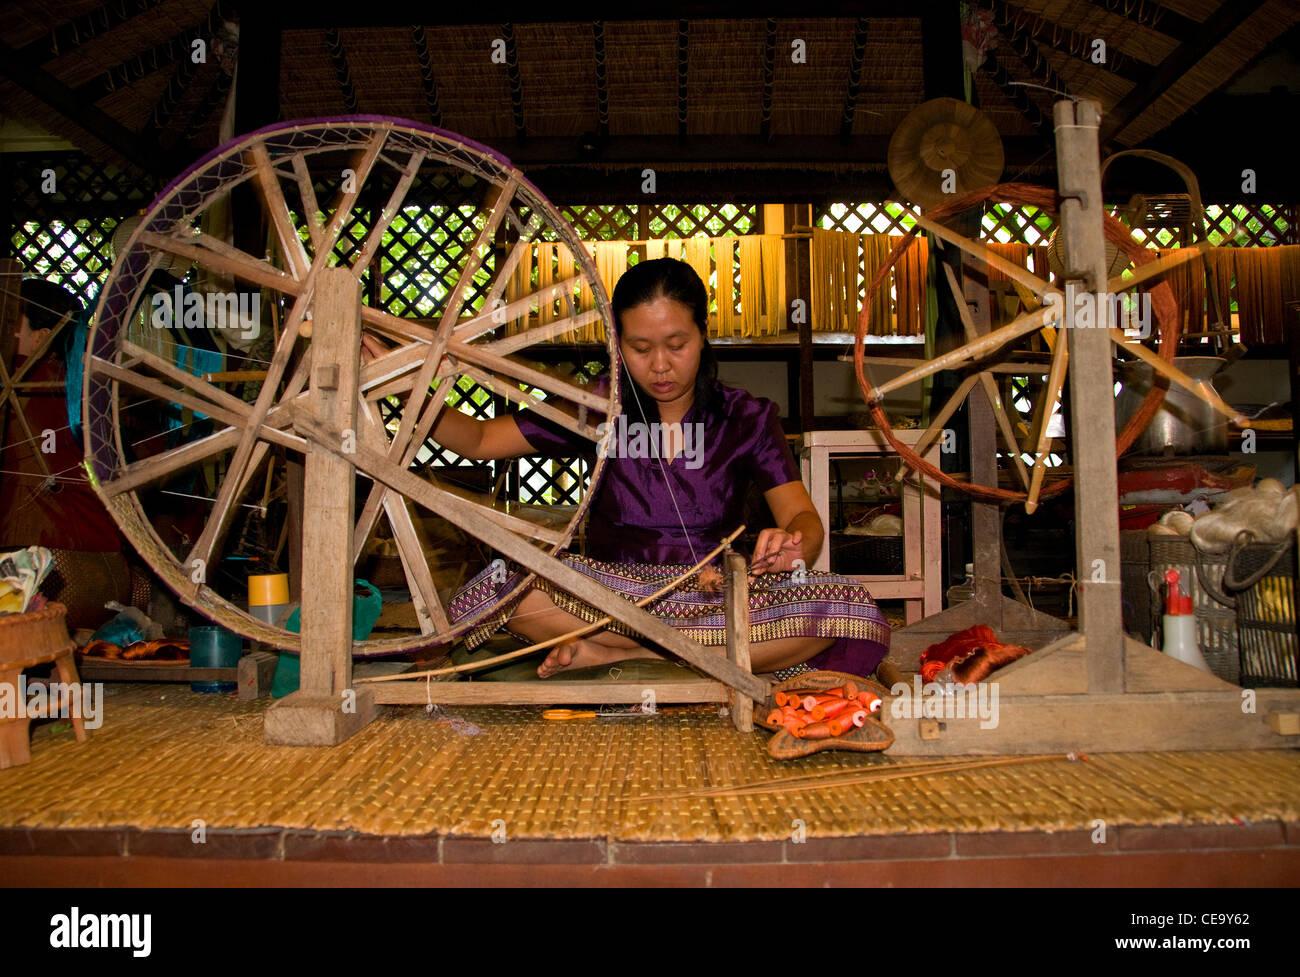 Thai silk production factory, Chiang Mai, Thailand. - Stock Image